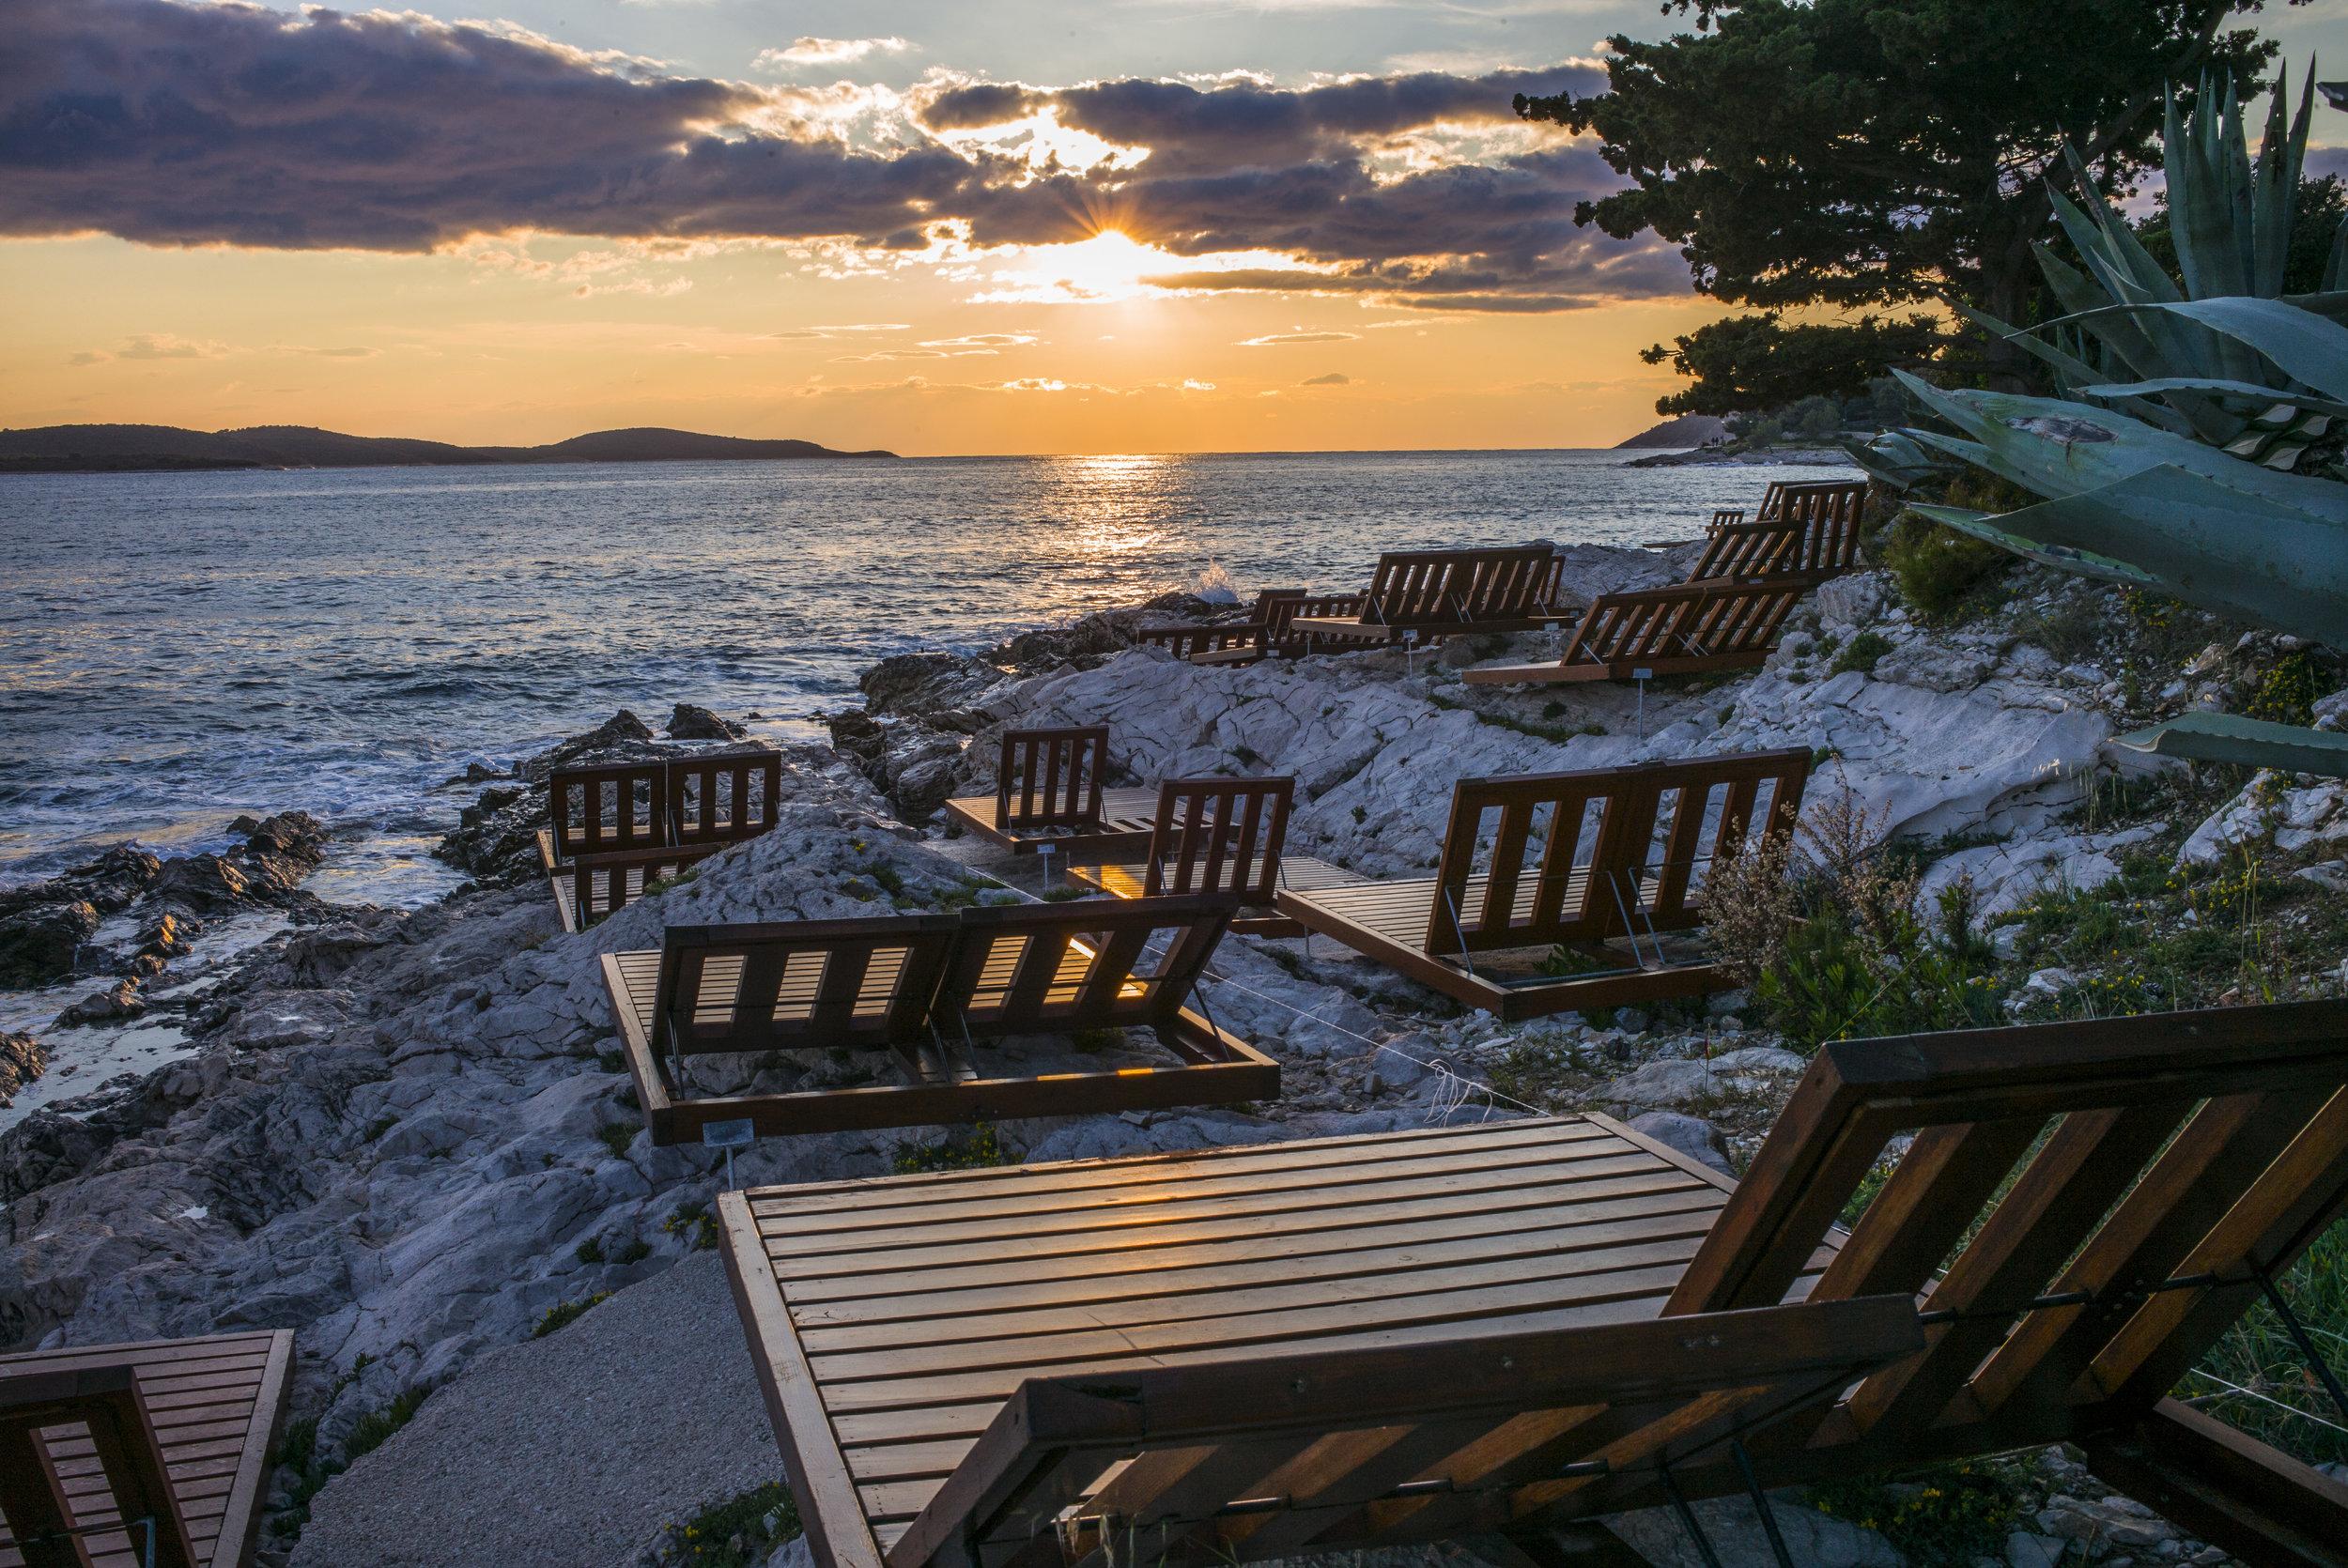 Sunset on the Adriatic shoreline of Hvar